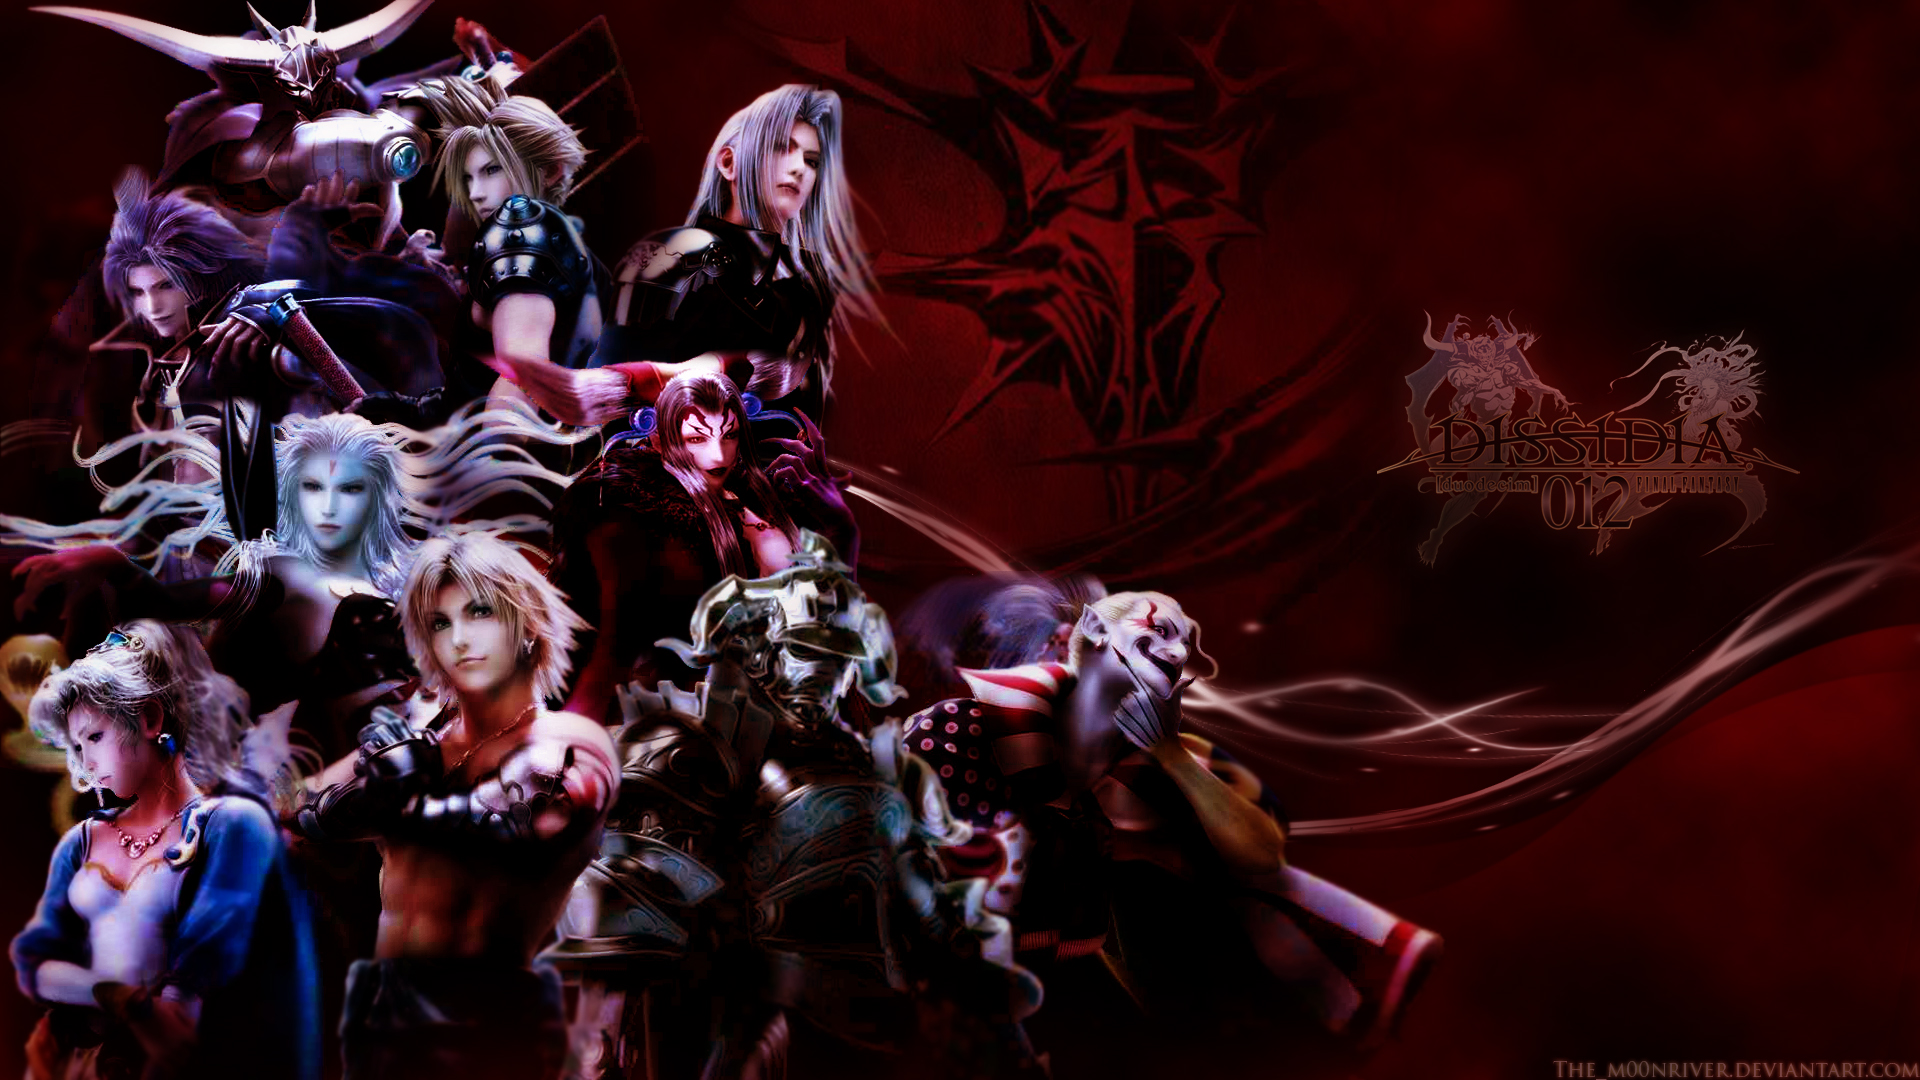 Final Fantasy Series Hd Wallpaper 1098403 Zerochan Anime Image